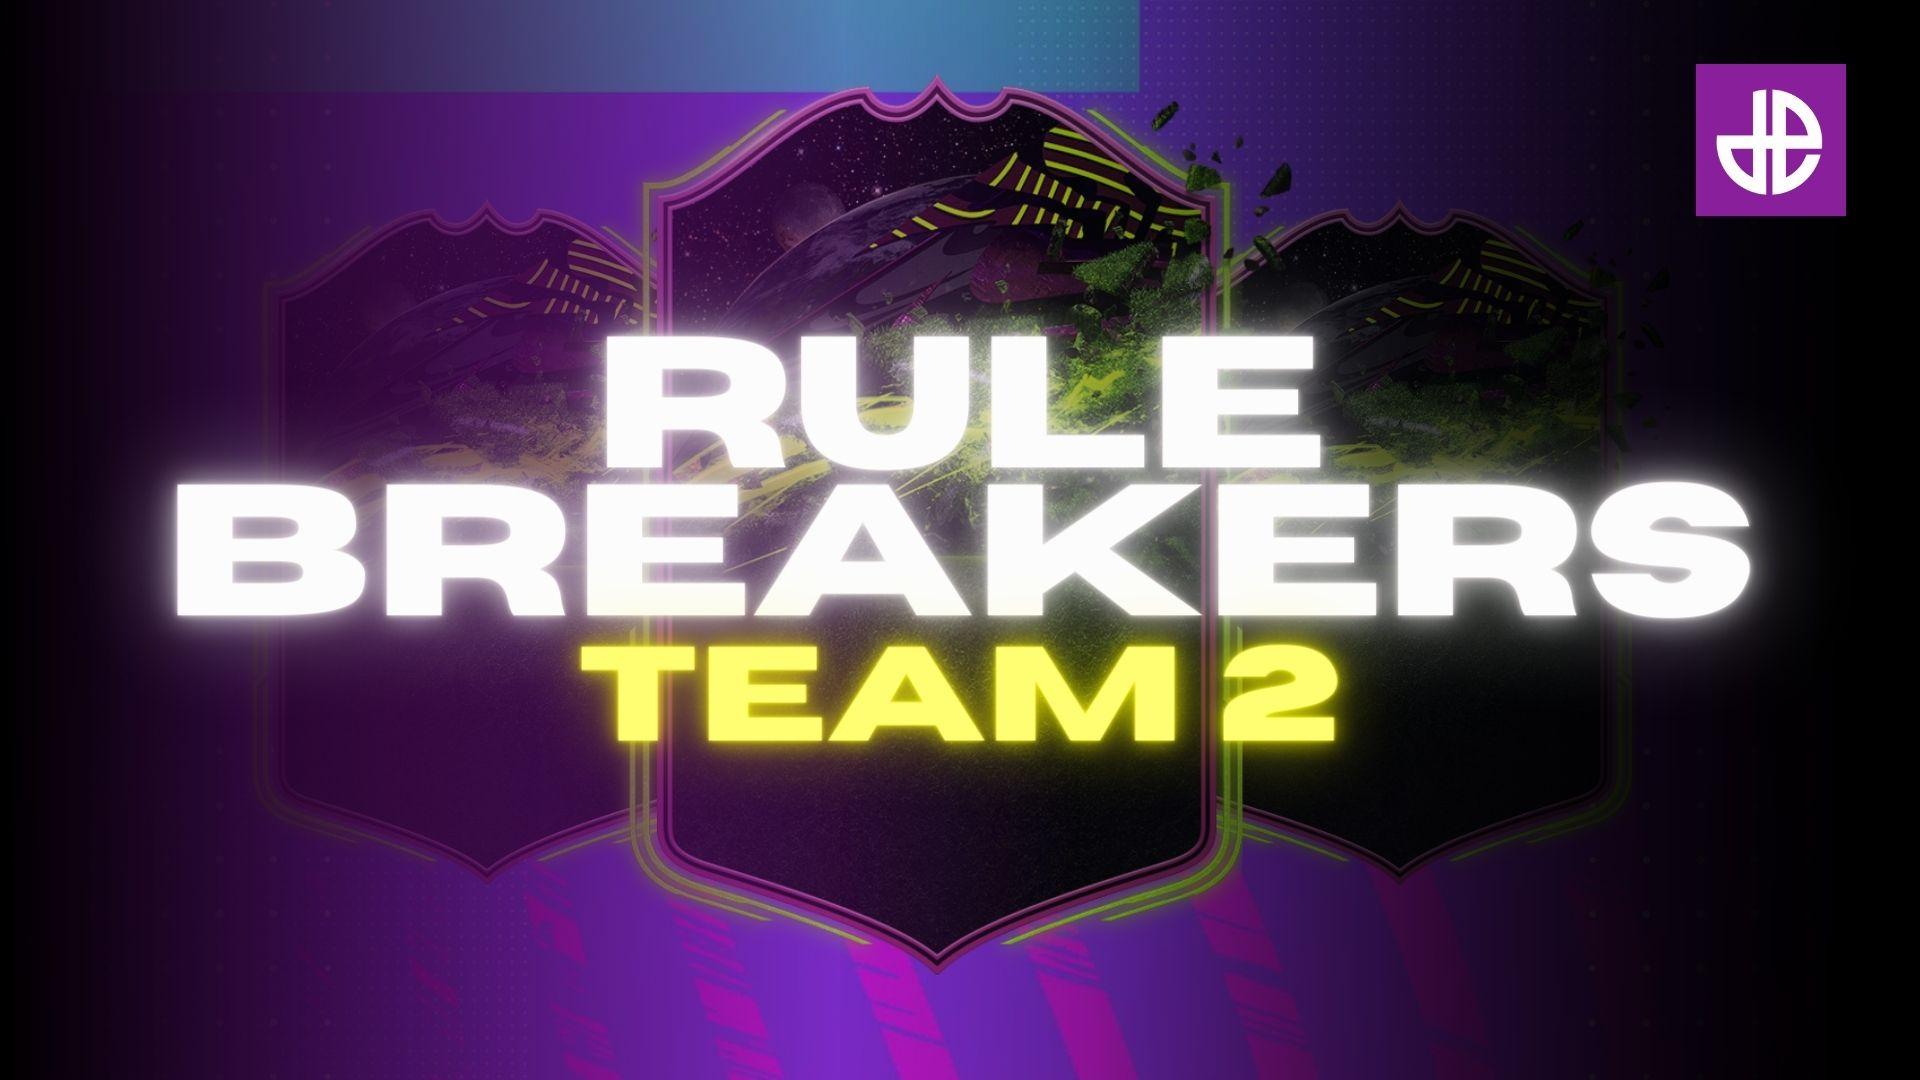 FIFA 21 rulebreakers team 2